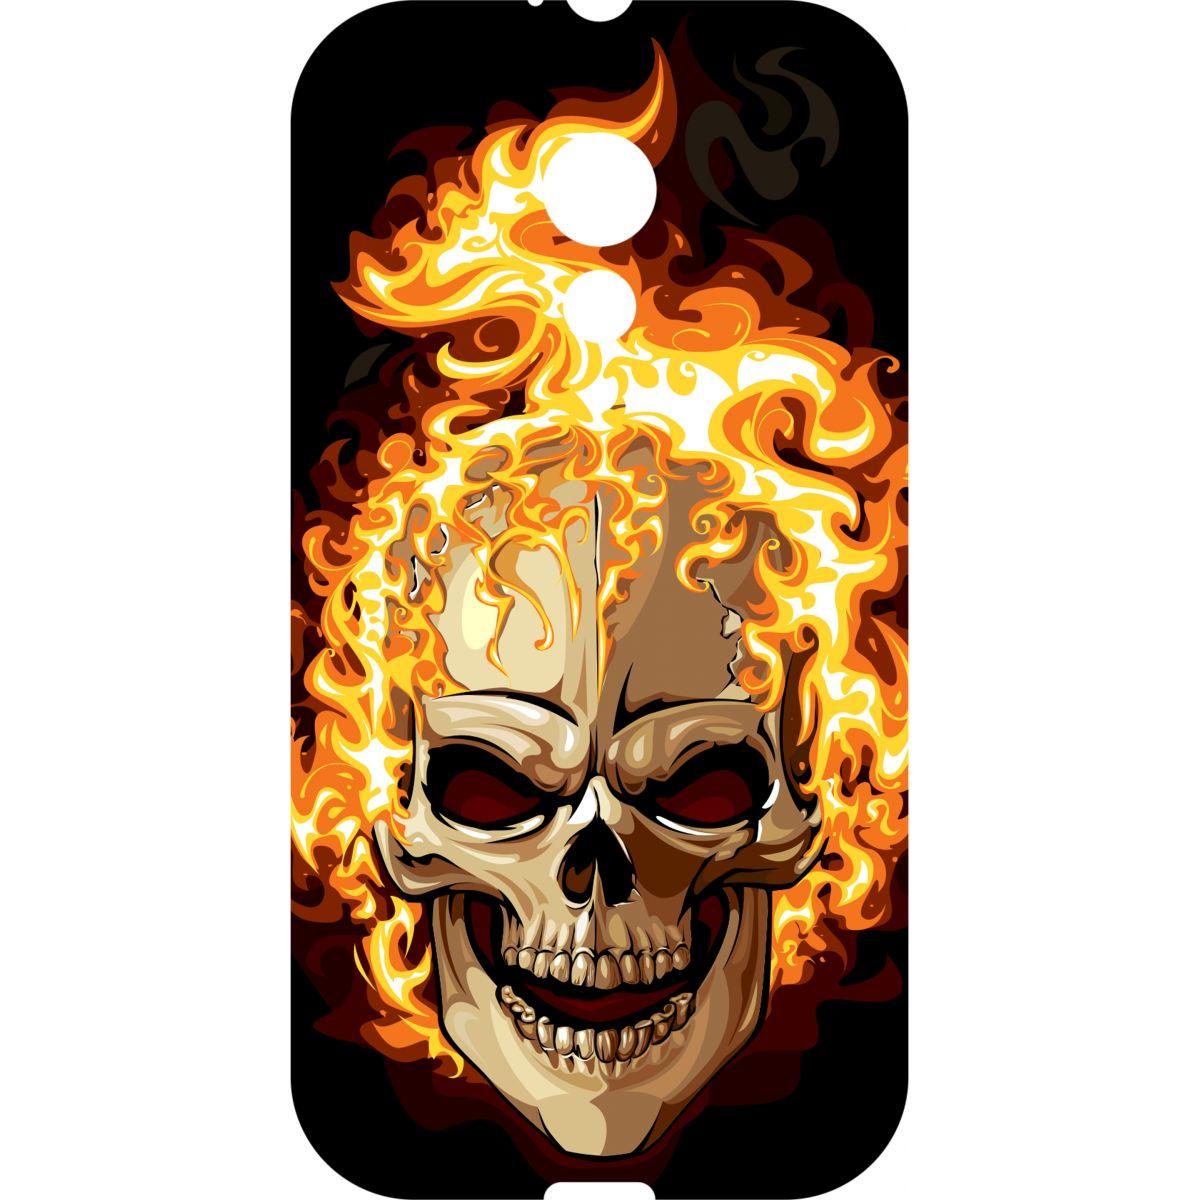 Capa Personalizada Exclusiva Motorola Moto G2 Xt1069 Xt1068 - MS55